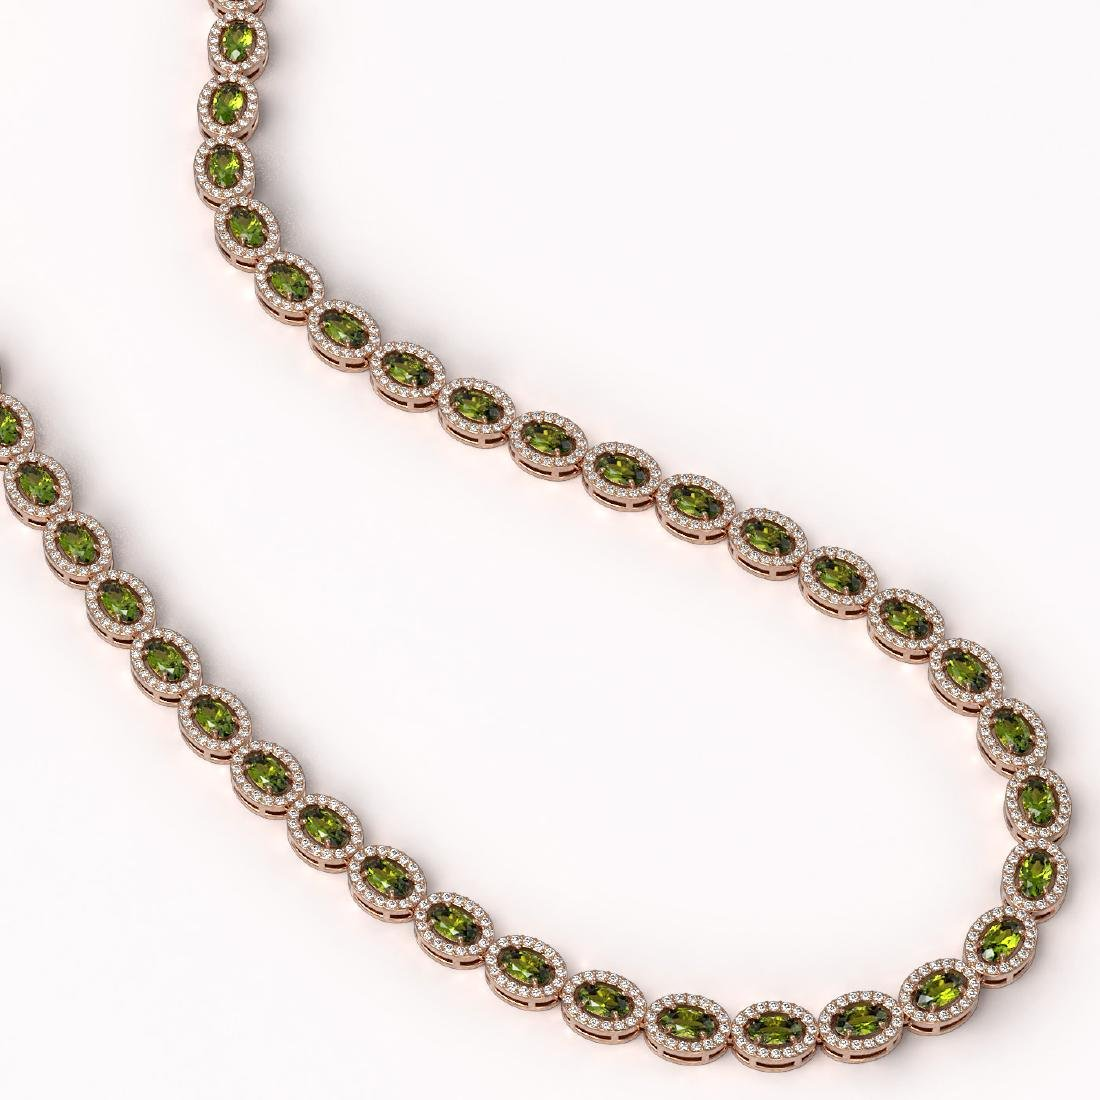 23.57 CTW Tourmaline & Diamond Halo Necklace 10K Rose - 2